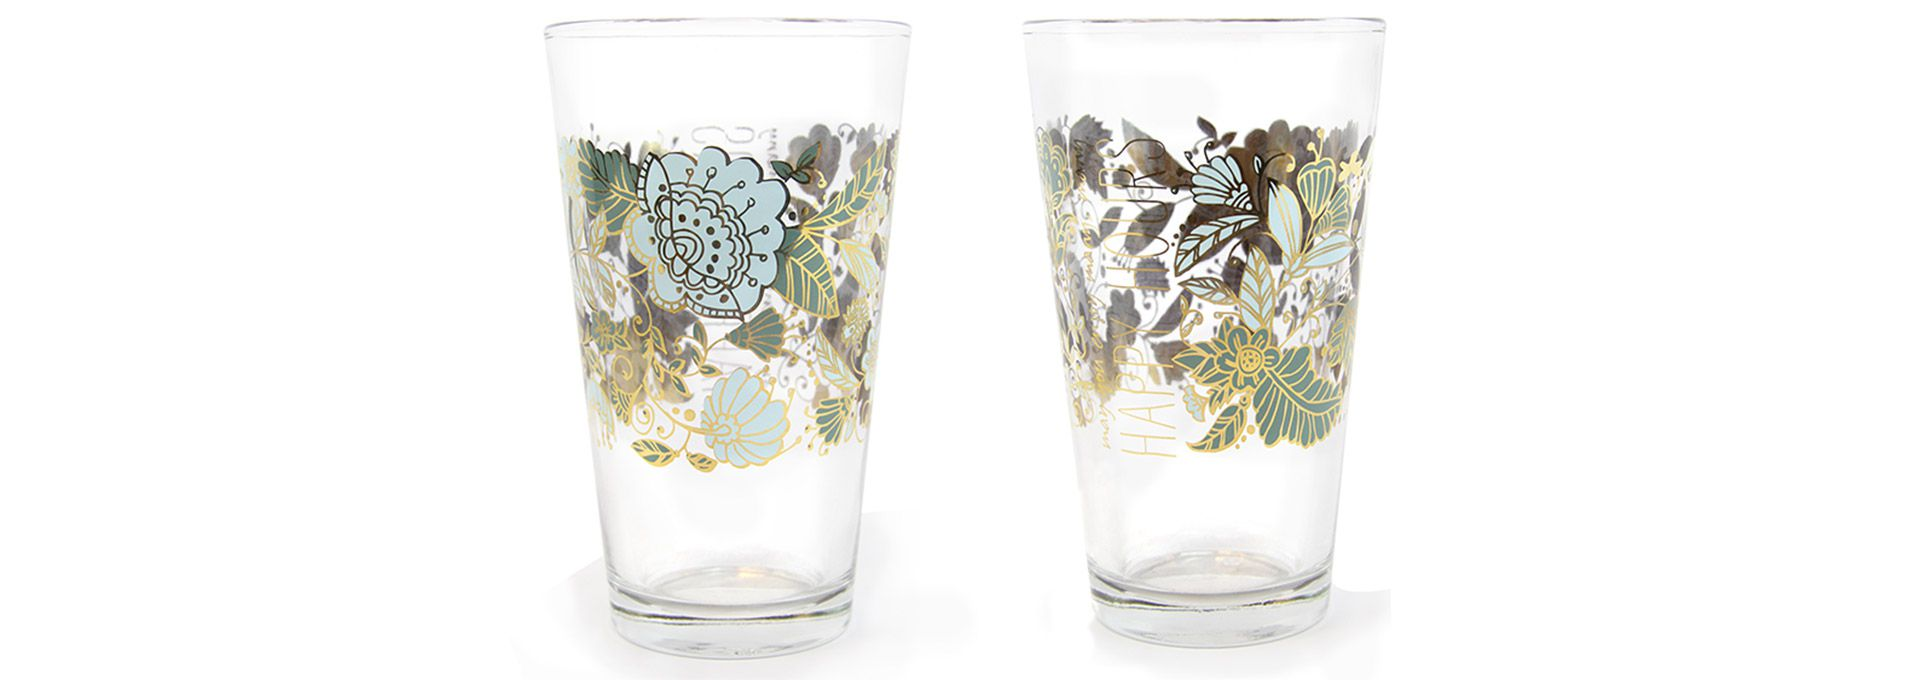 Custom Designed Promotional Glasses & Glassware Seattle